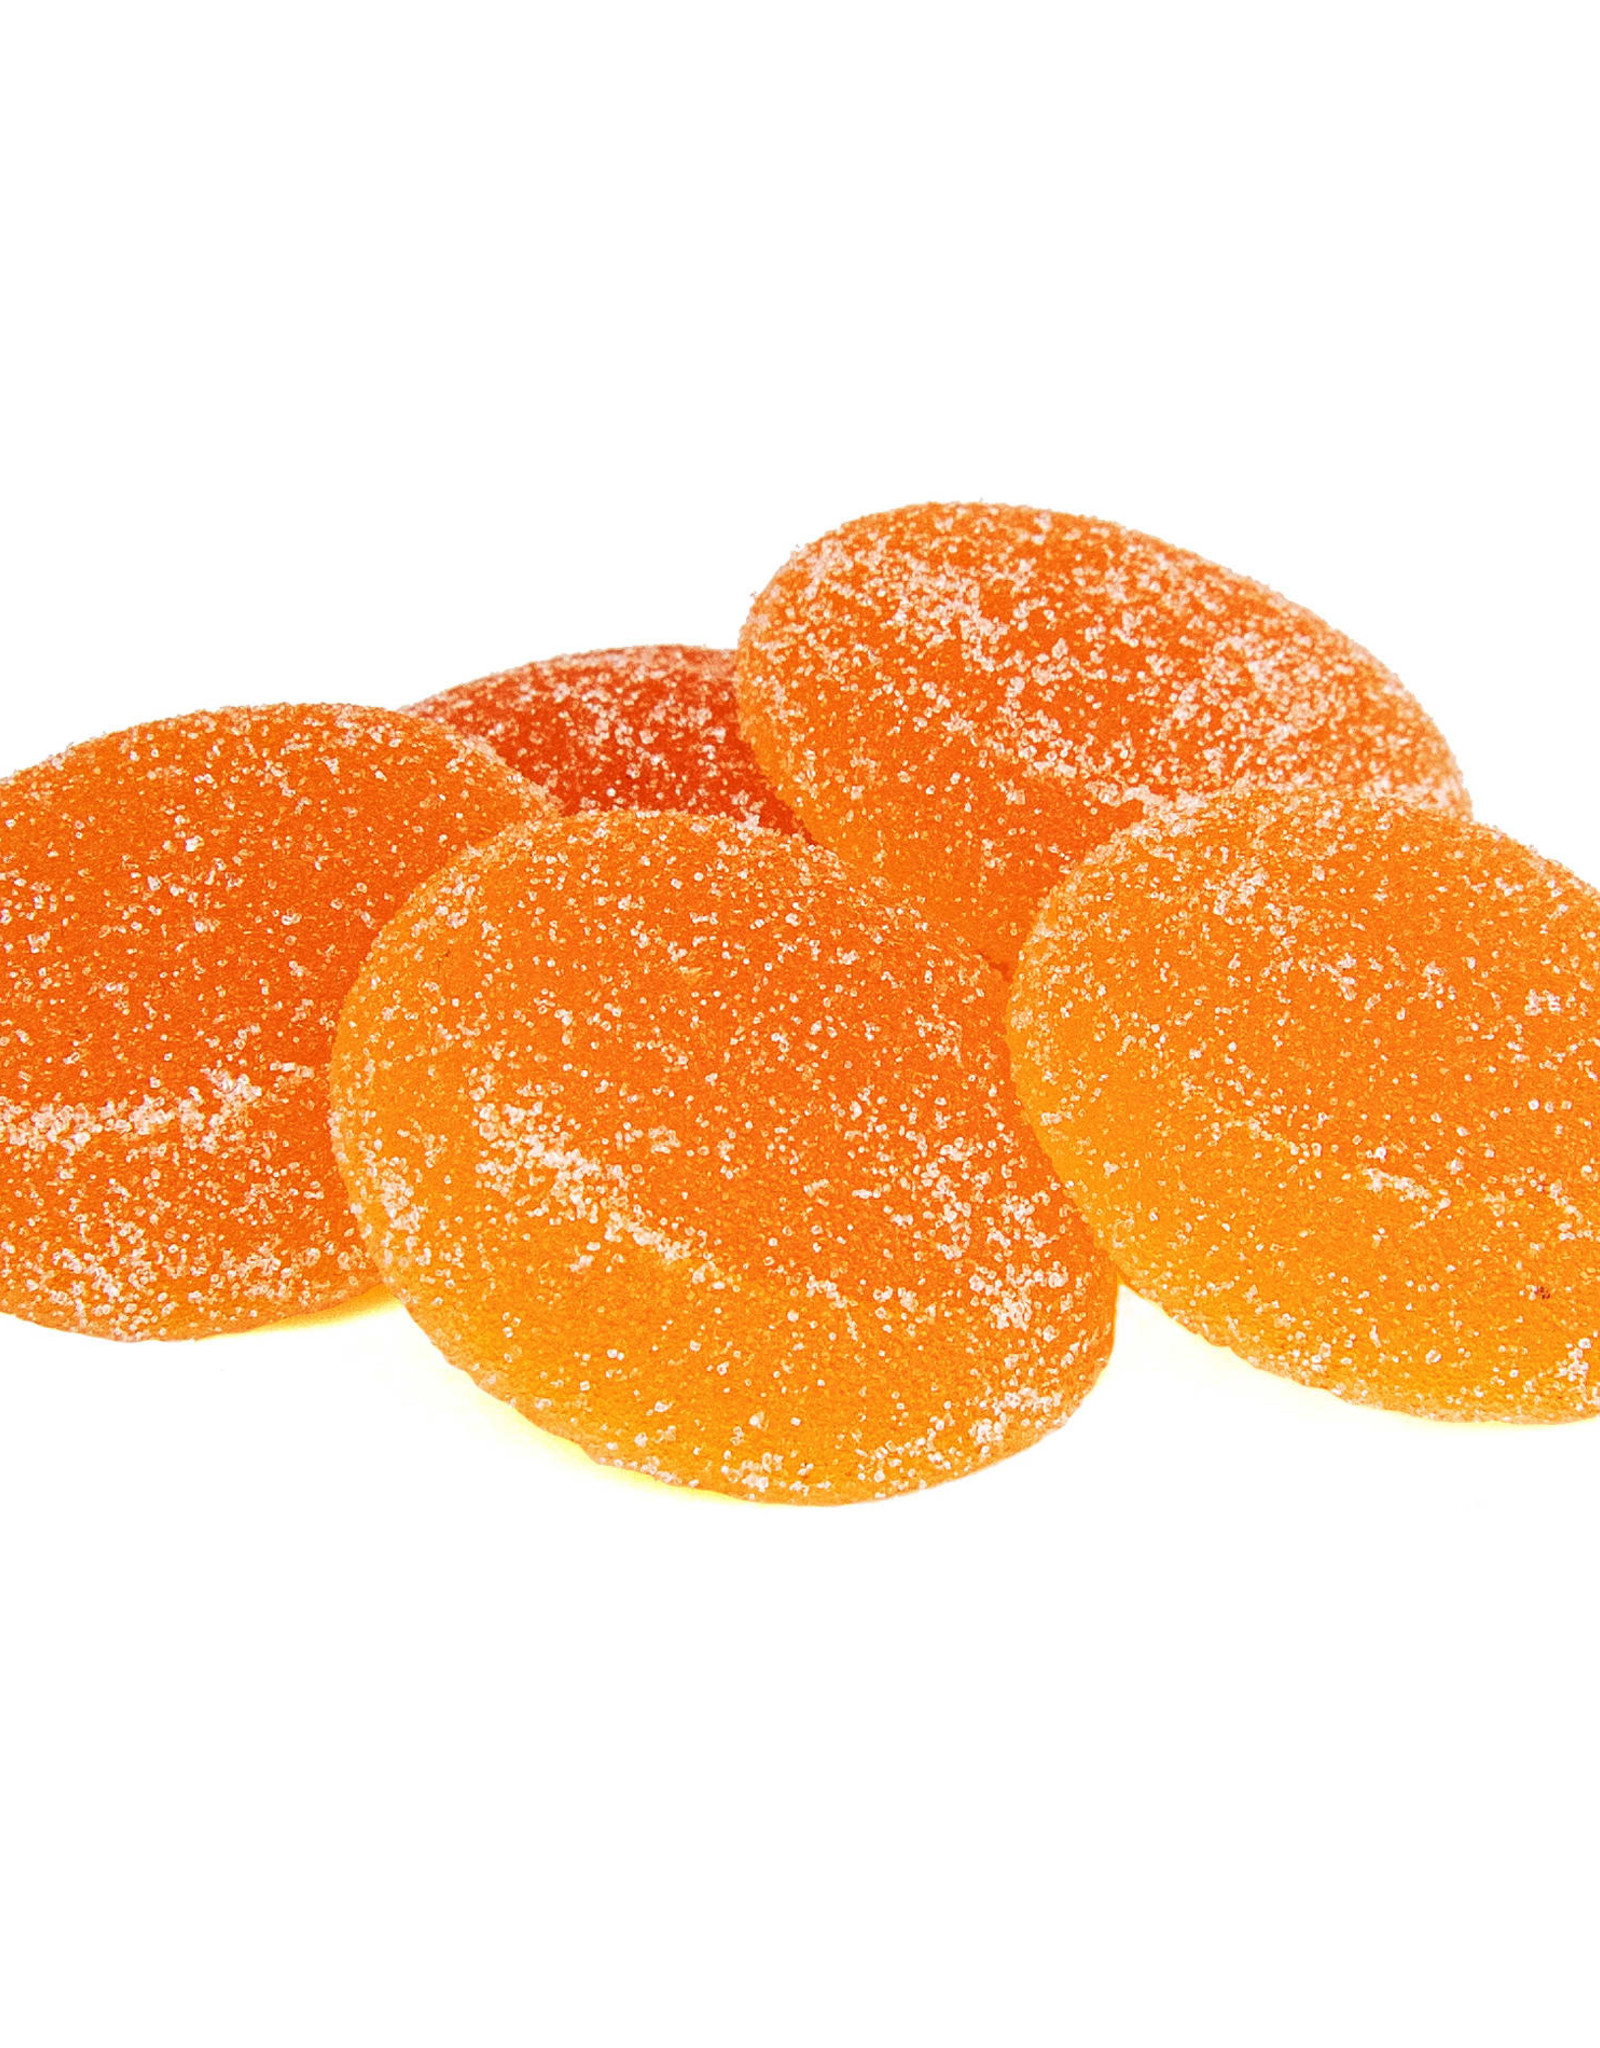 Sunshower **Sunshower - Mango Tangerine Gummies